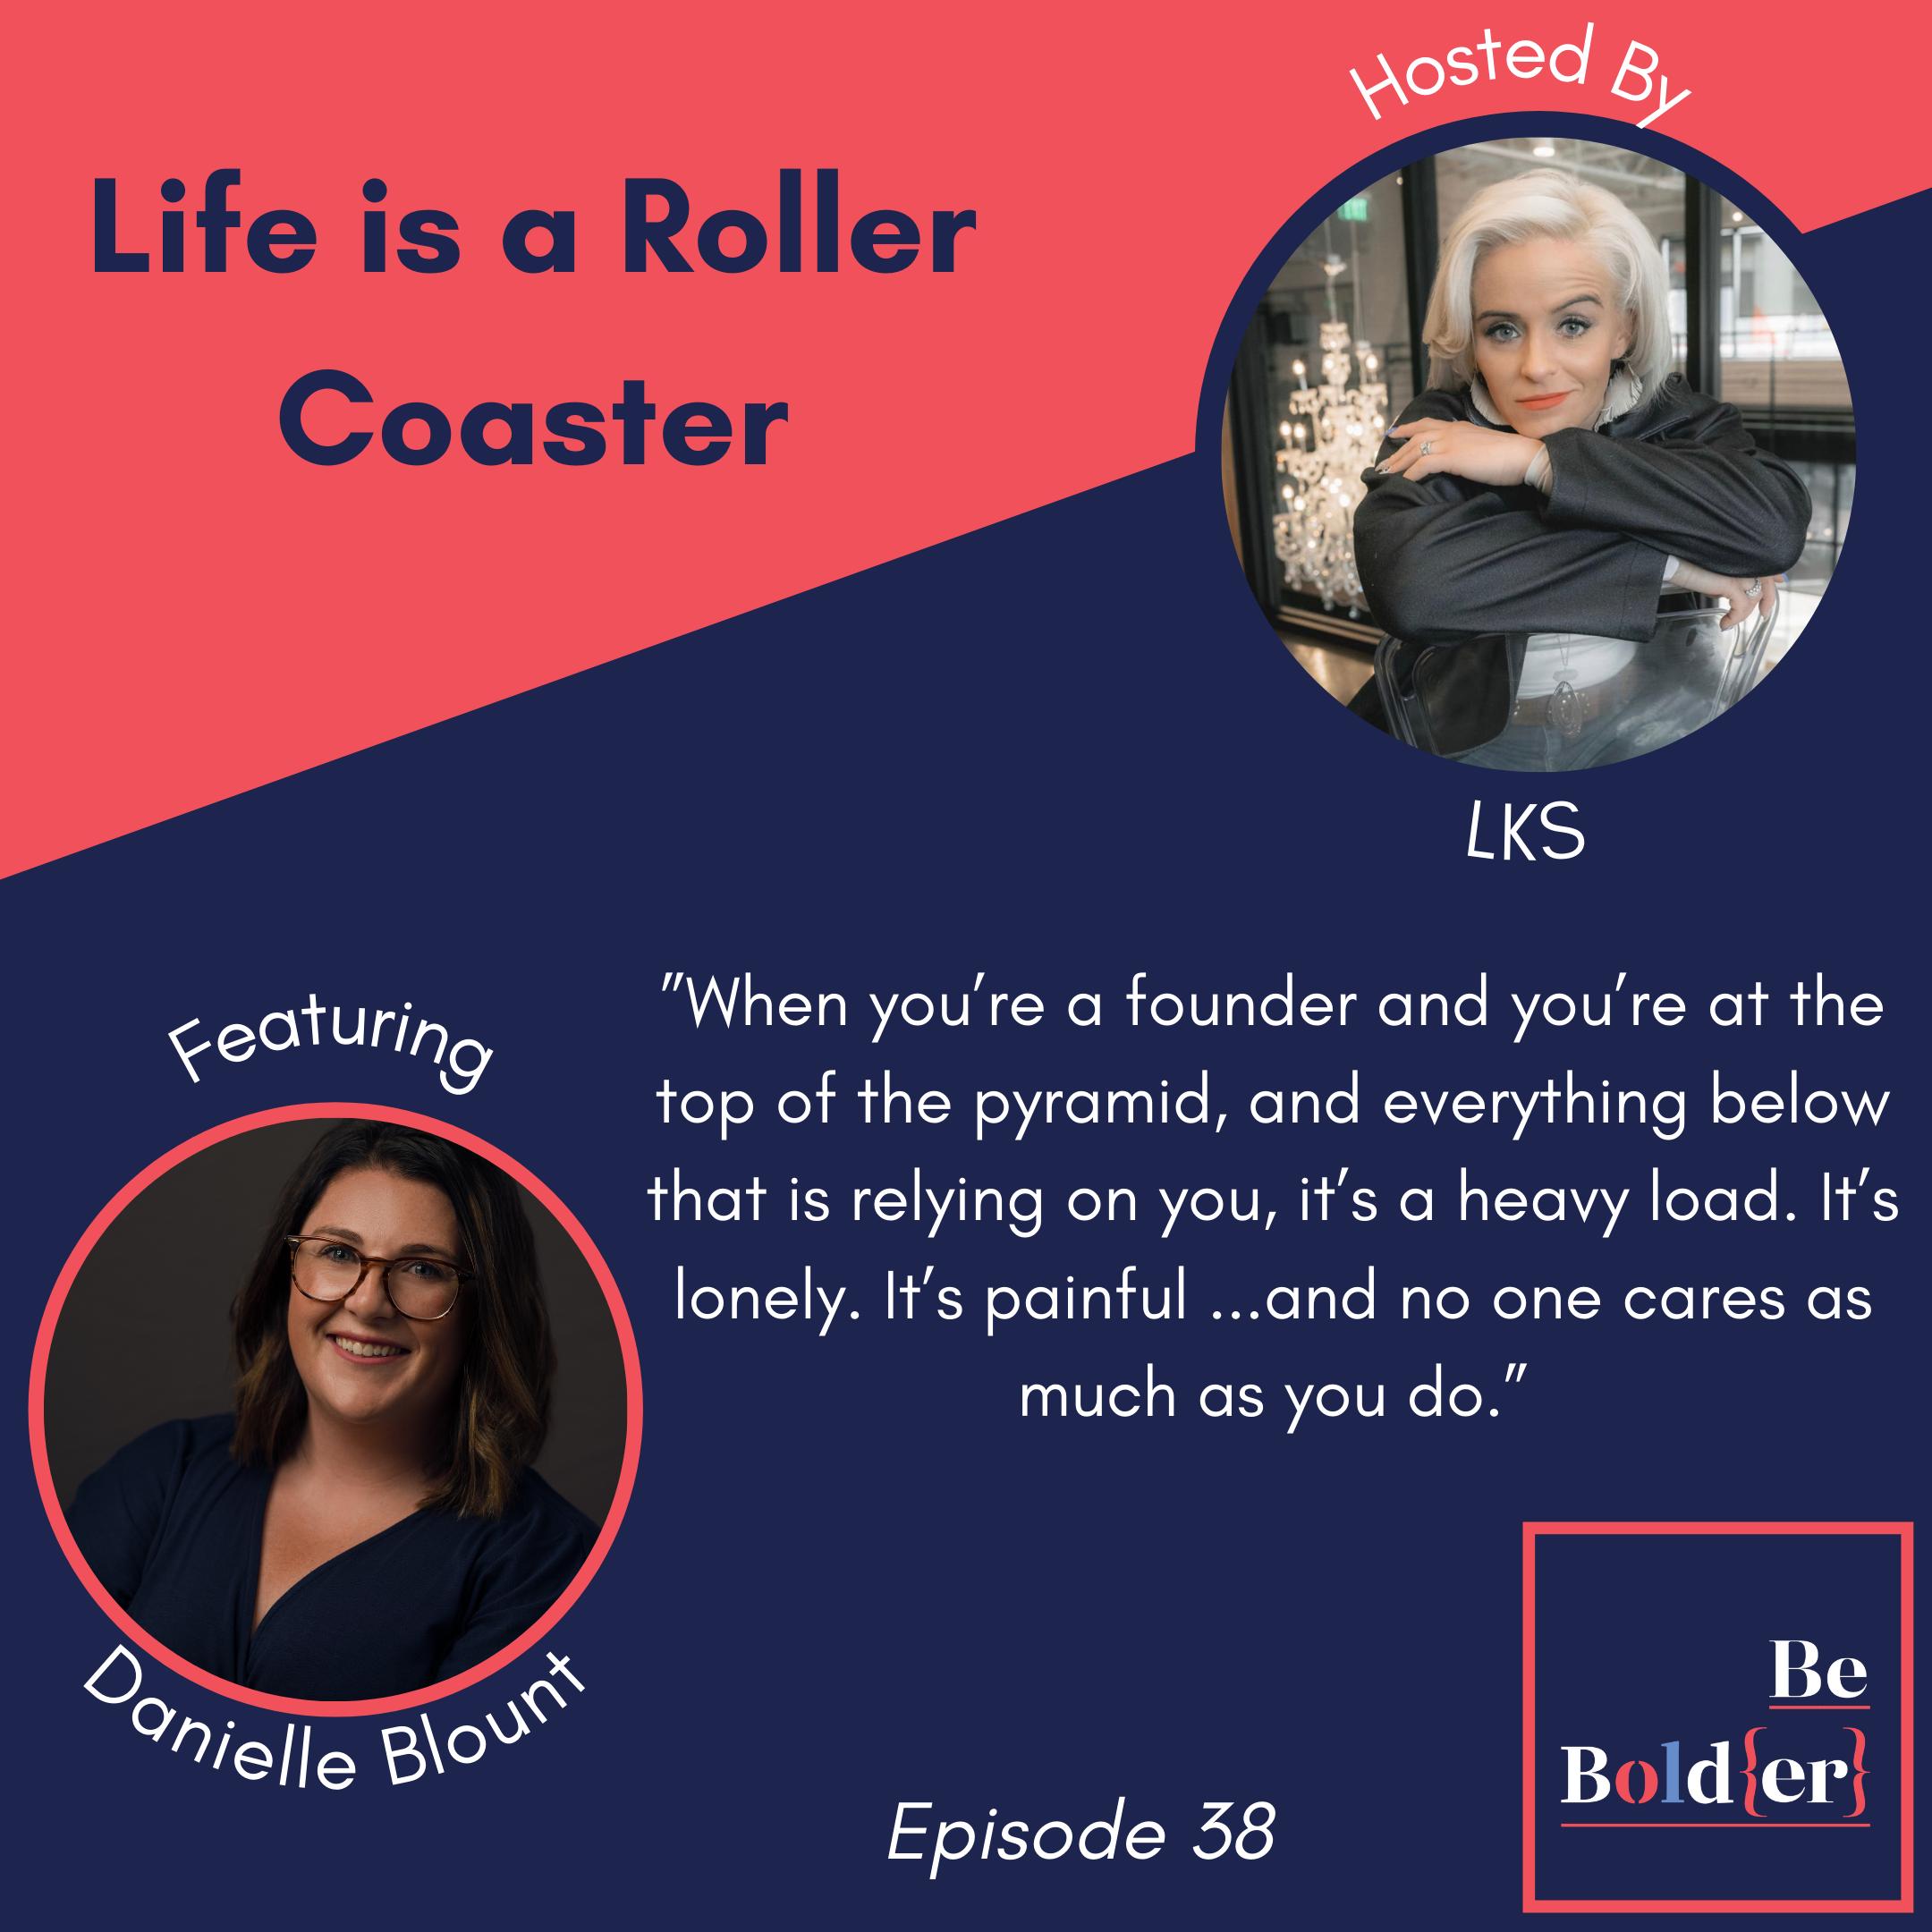 Life is a Roller Coast Feat. Danielle Blount – Episode 38